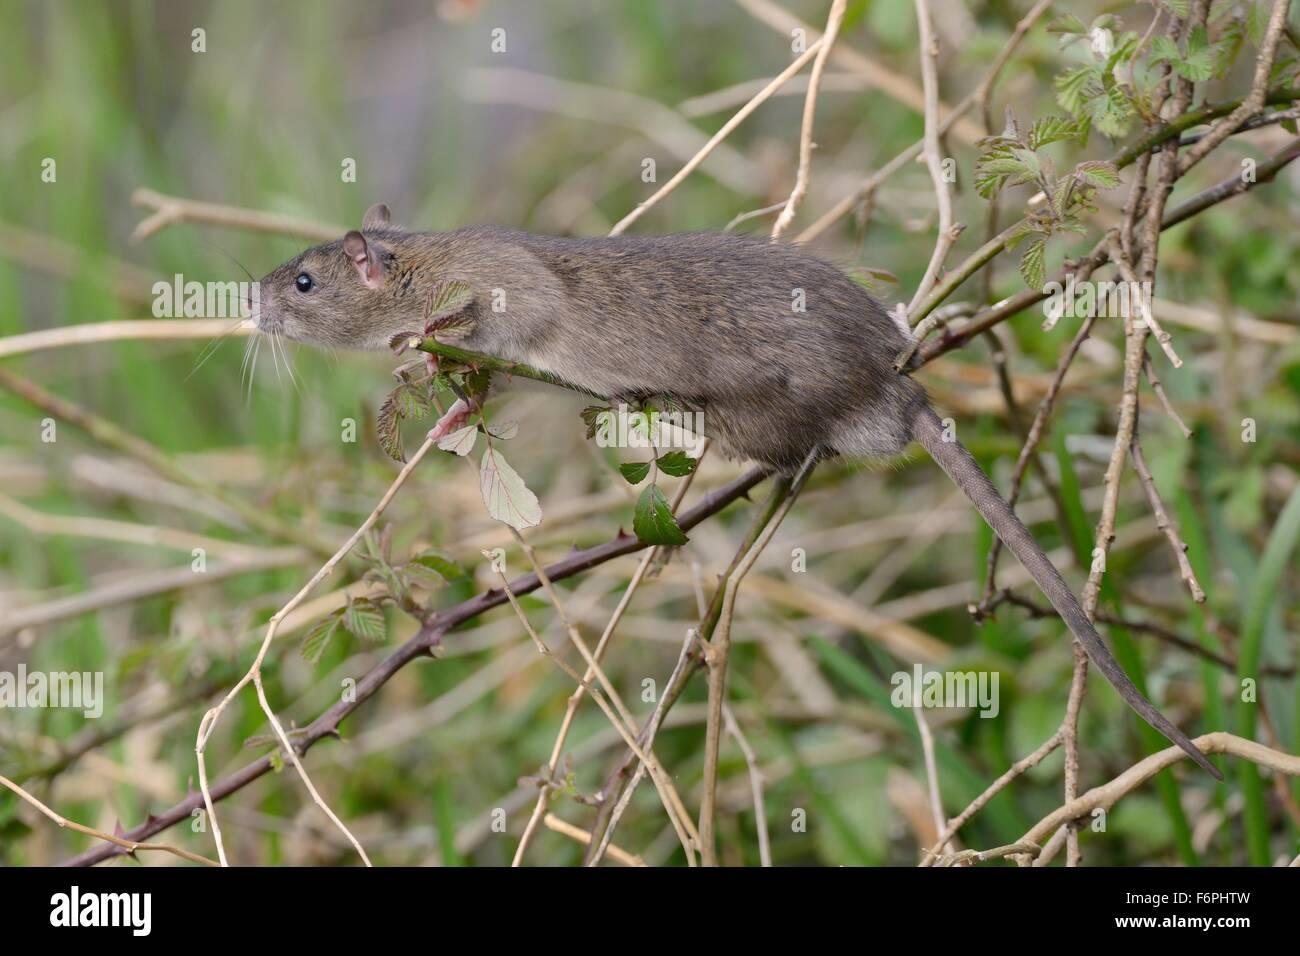 Juvenile Brown rat (Rattus norvegicus)  climbing in a Bramble bush, Gloucestershire, UK, April. - Stock Image